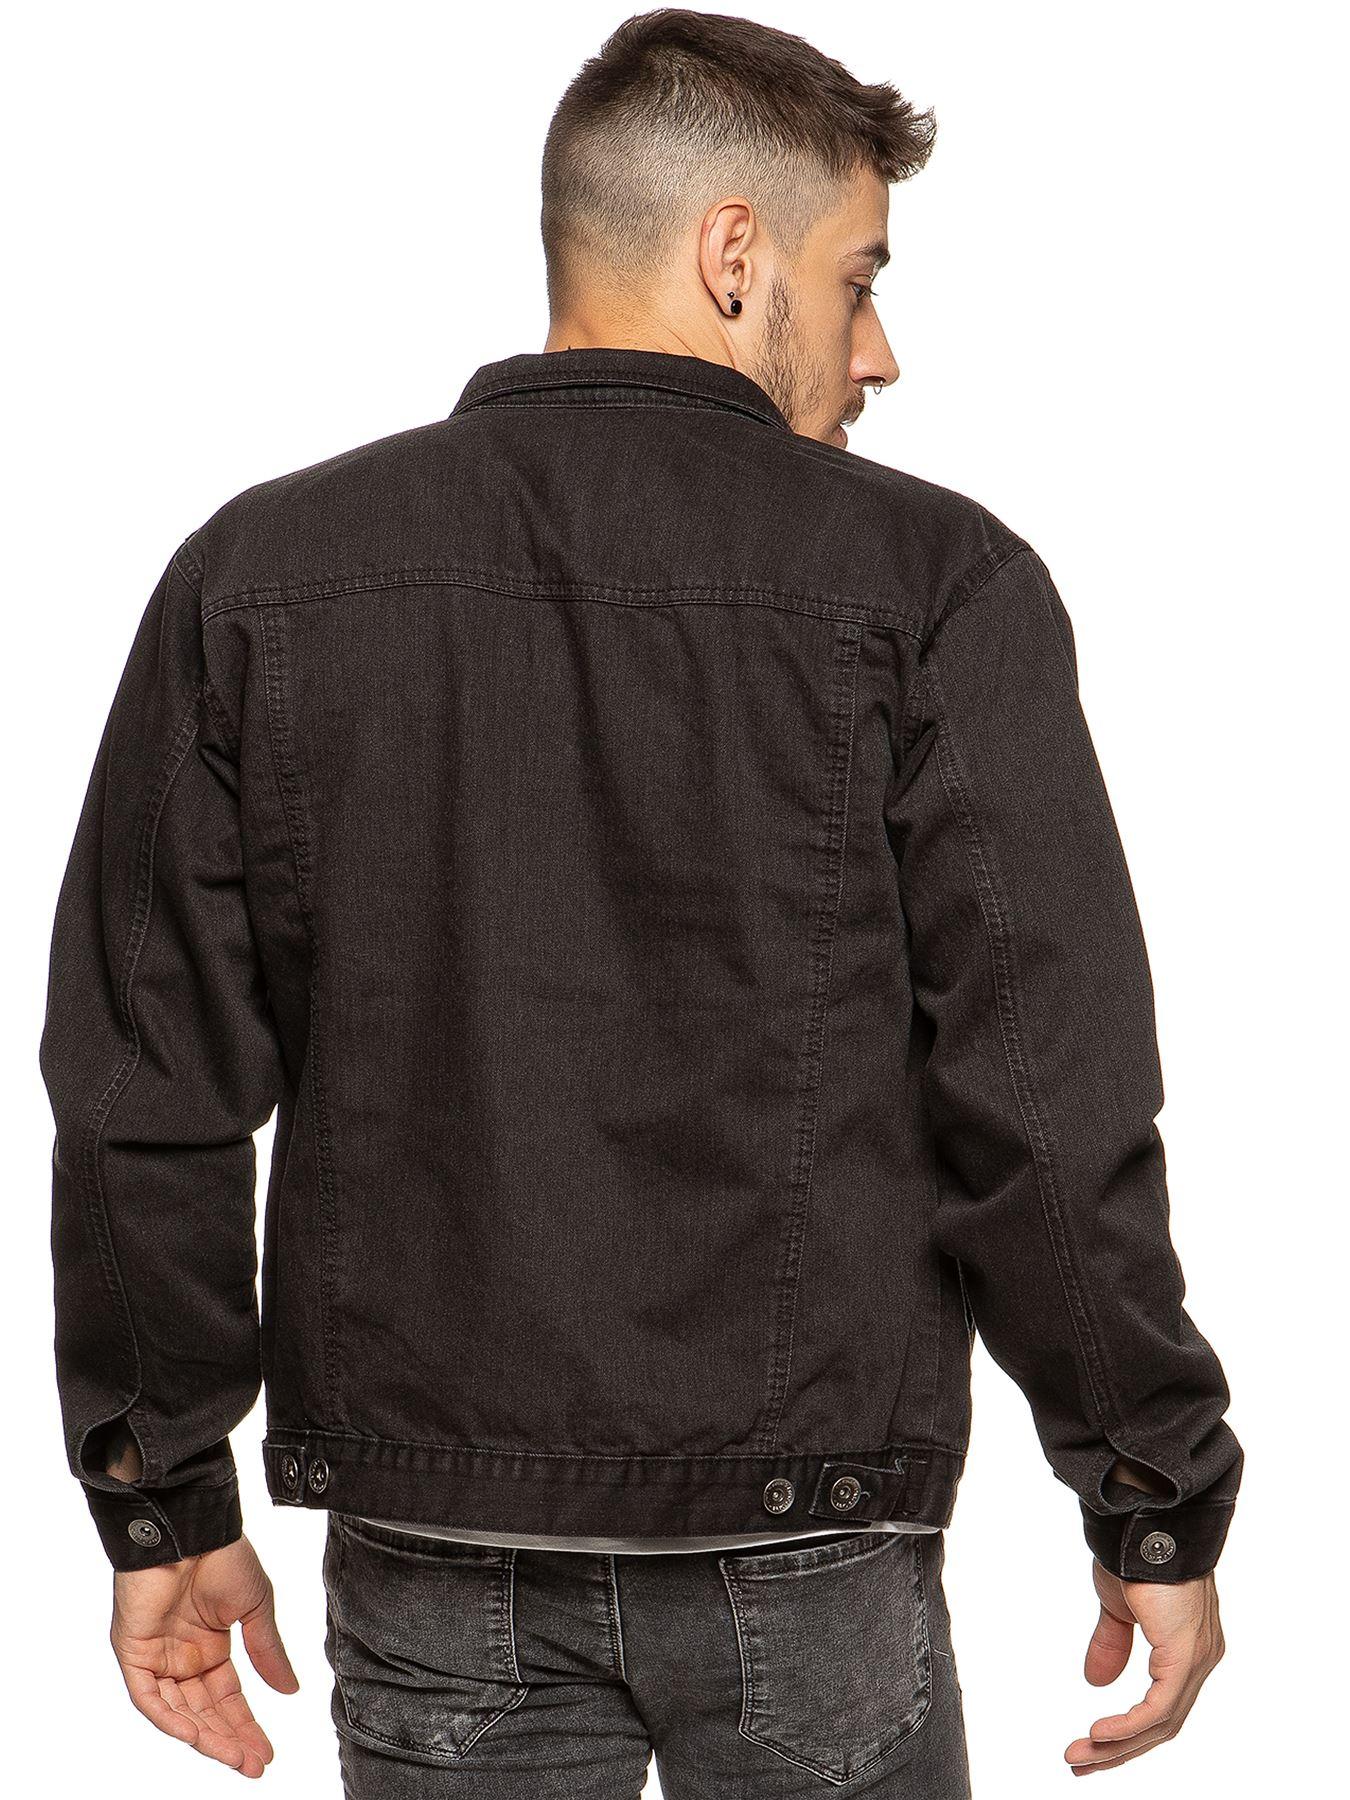 Enzo-Mens-Denim-Jacket-Classic-Western-Style-Designer-Trucker-Vintage-Style-Coat thumbnail 3